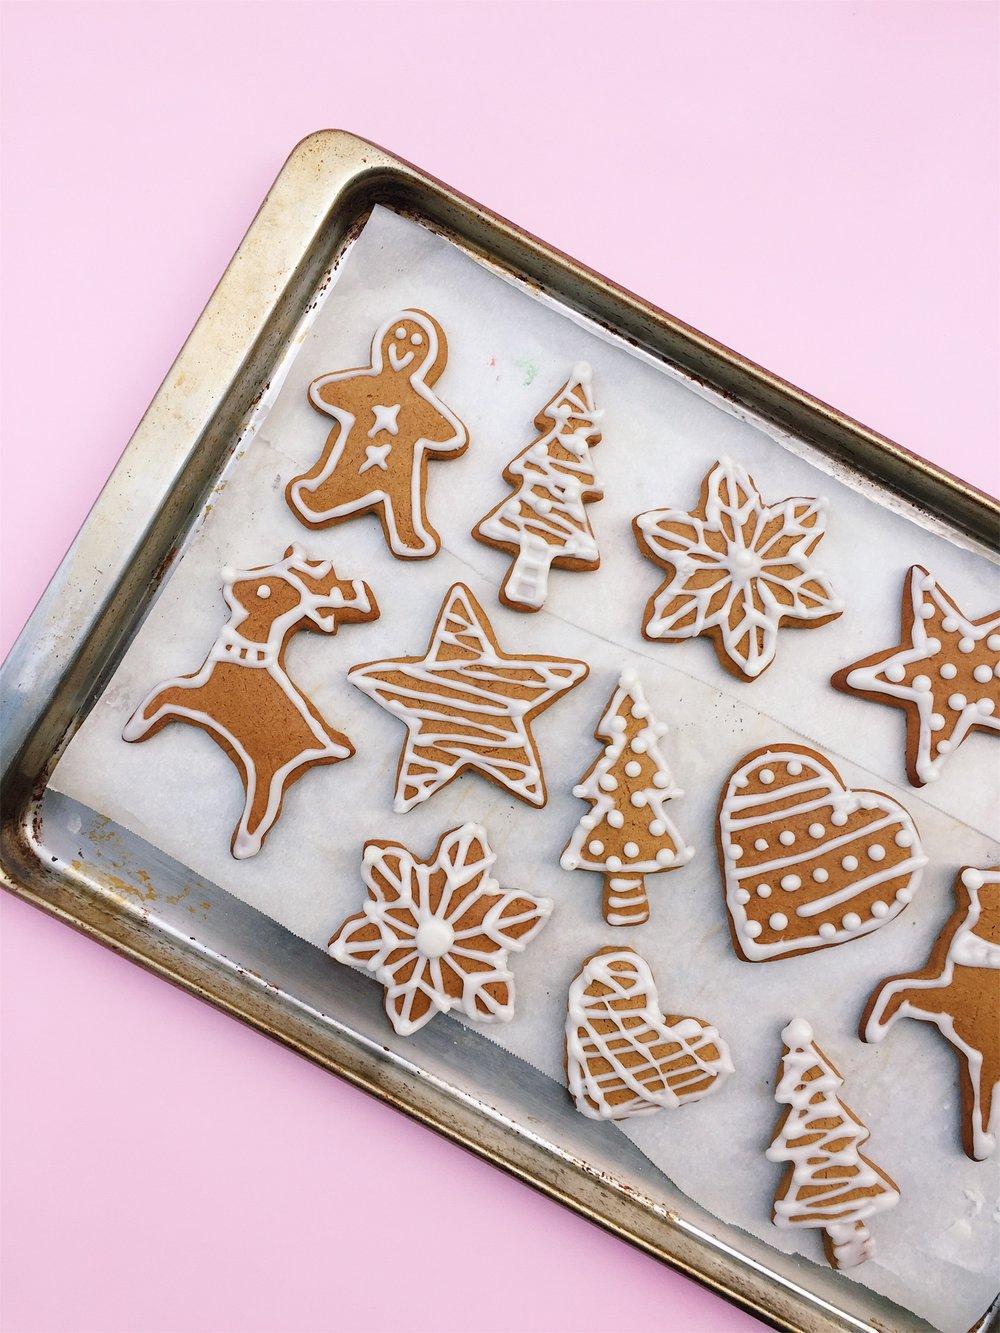 amy_chen_design_2018_highlight_reel_14_gingerbread_cookies.jpeg